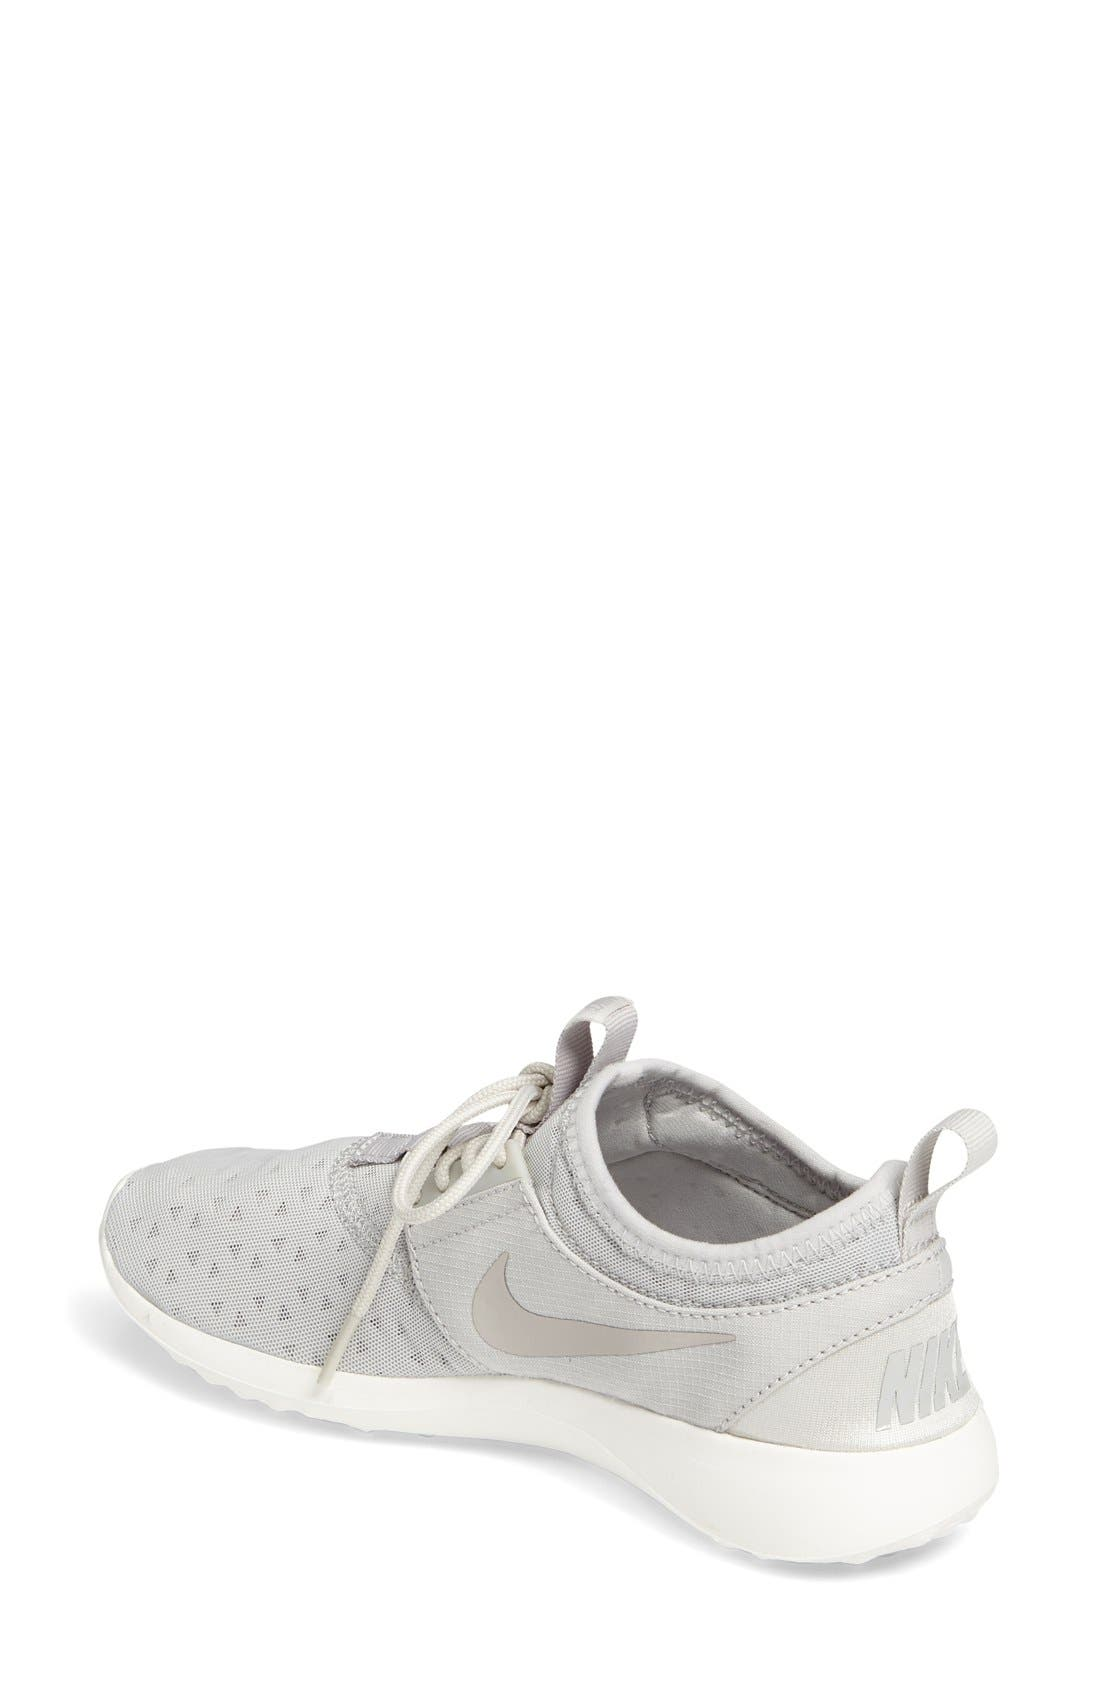 ,                             'Juvenate' Sneaker,                             Alternate thumbnail 115, color,                             250